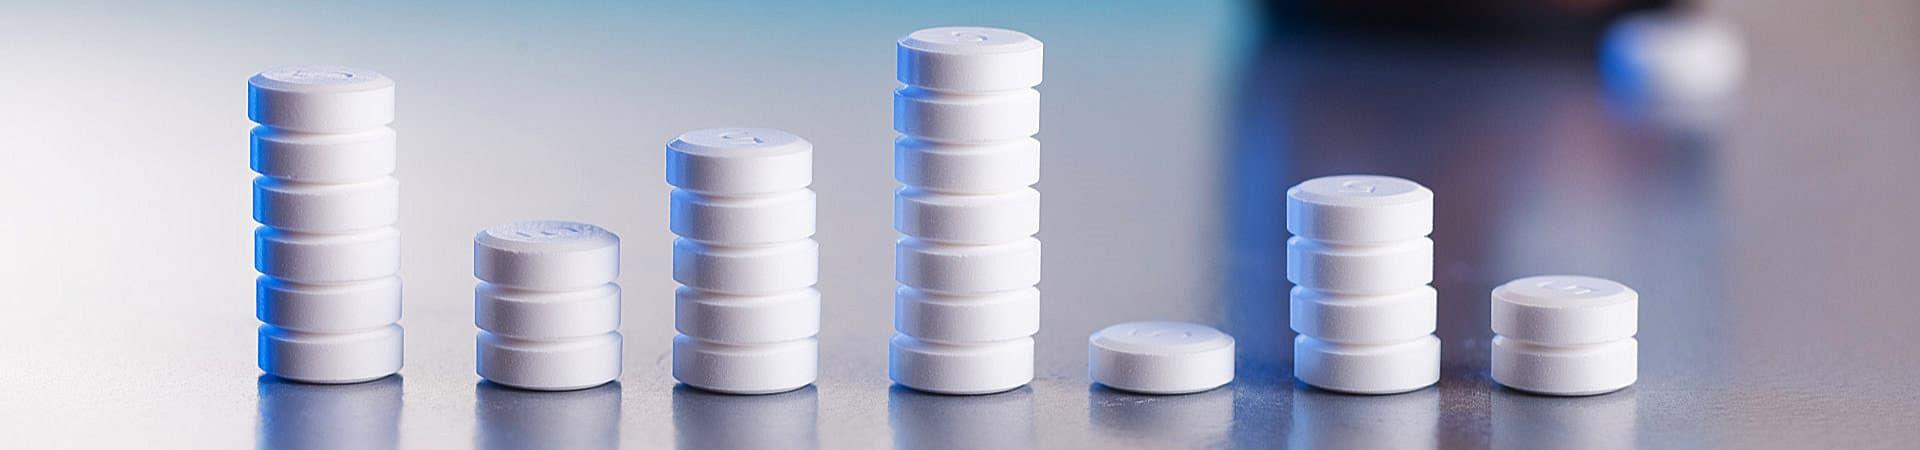 medicines tablets